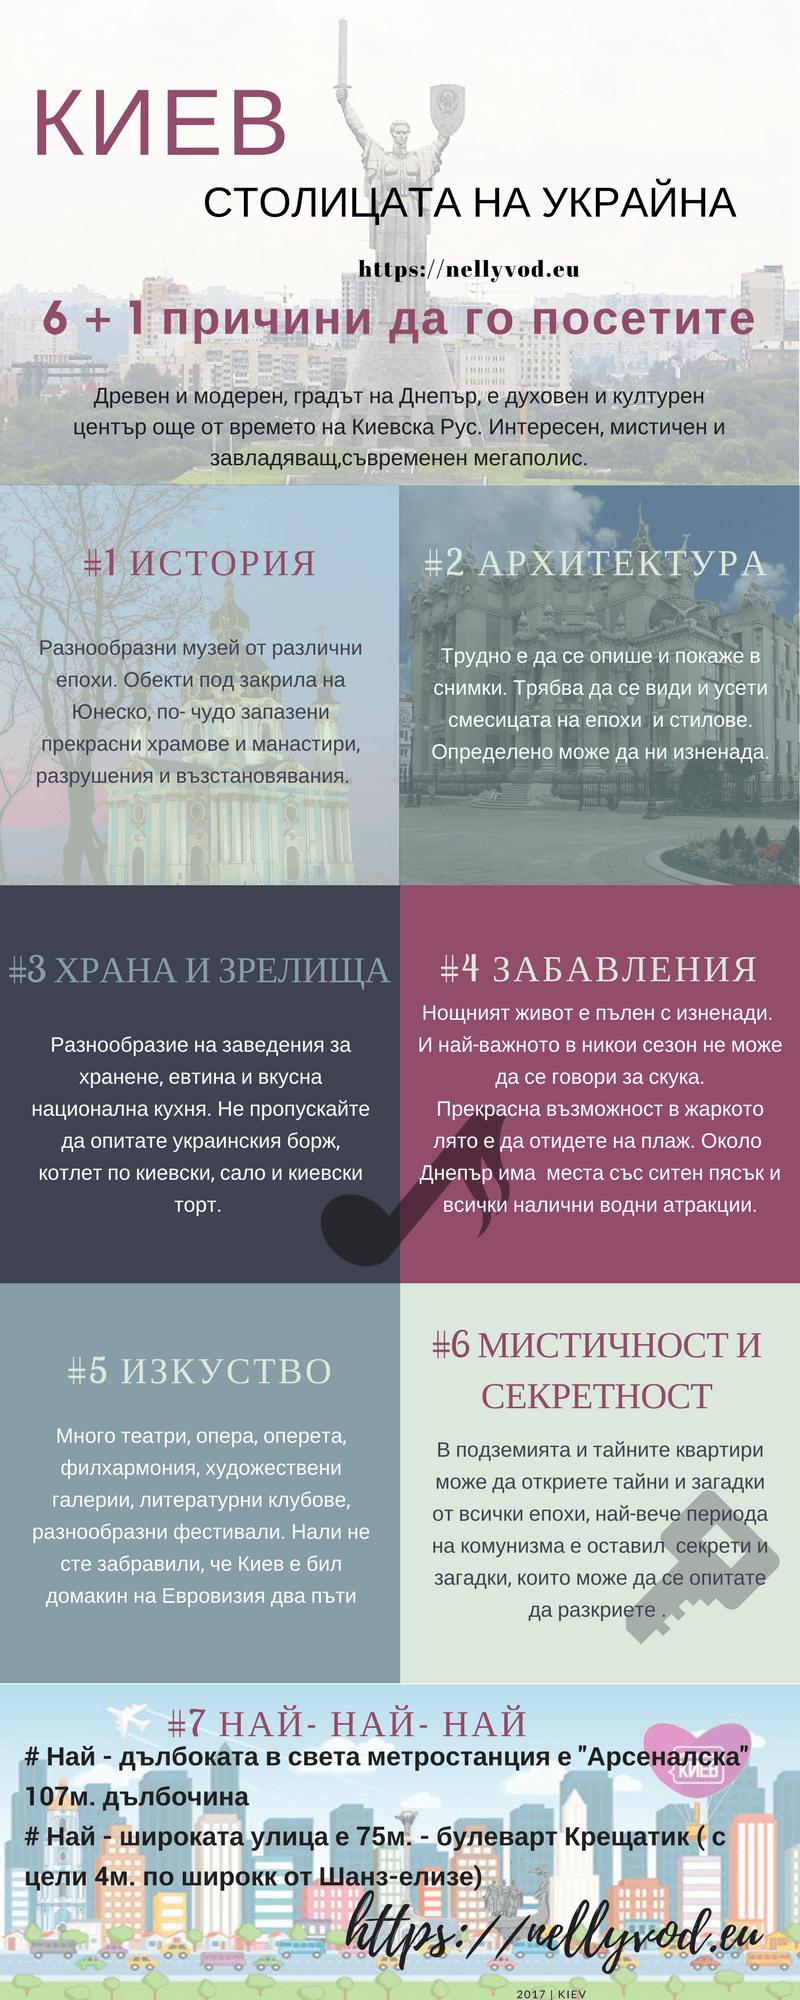 @nelly.jotova Киев